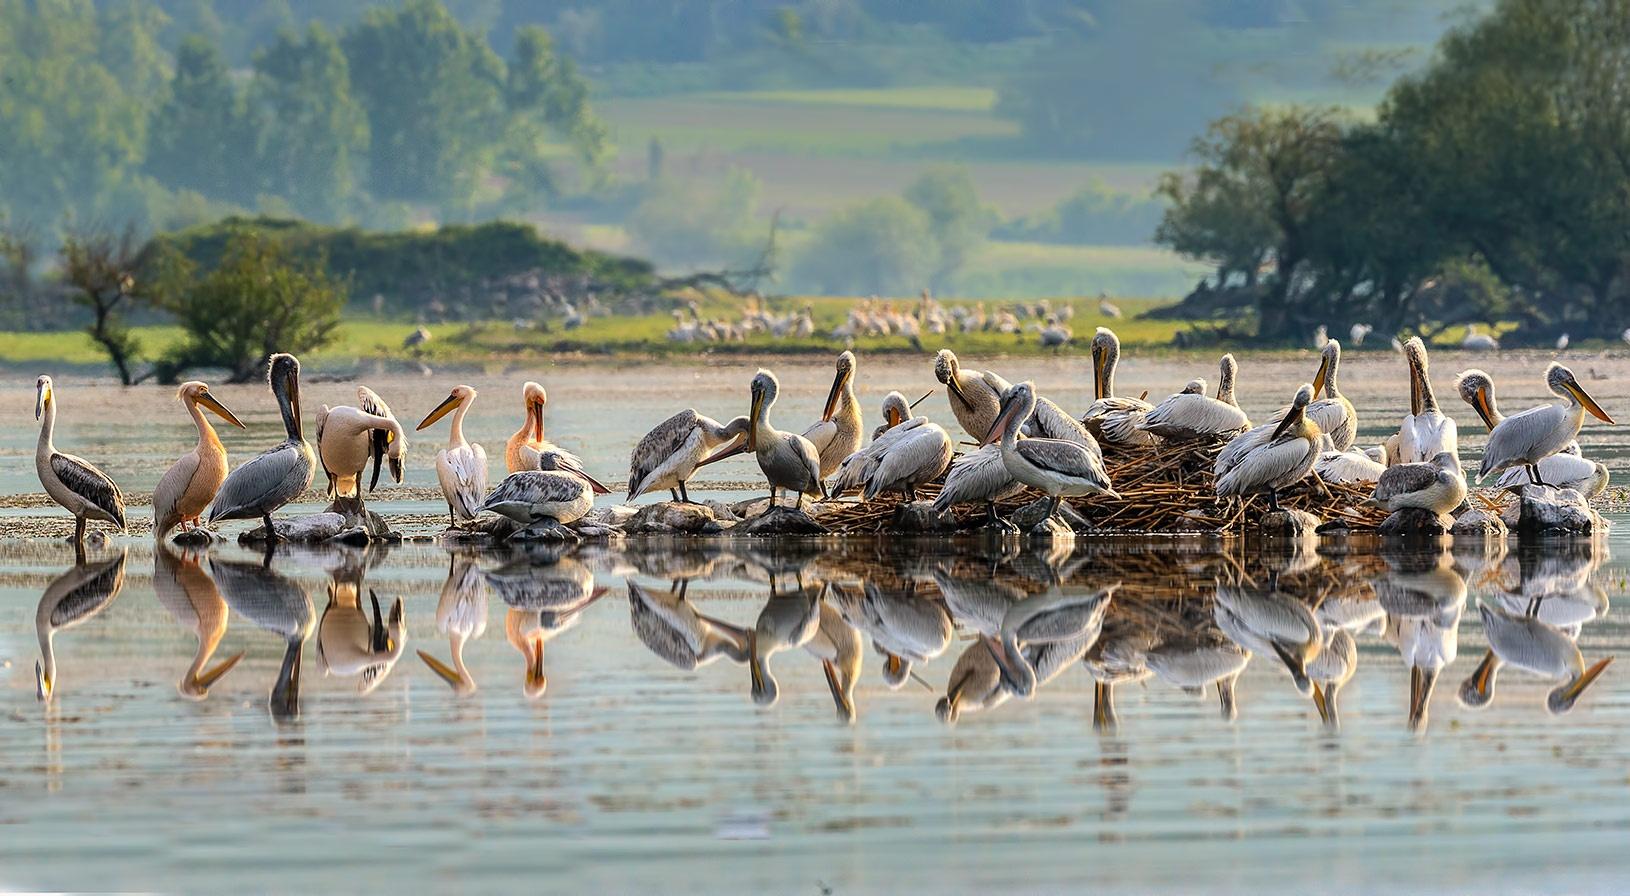 The wonderful world of birds. by Sotiris Siomis